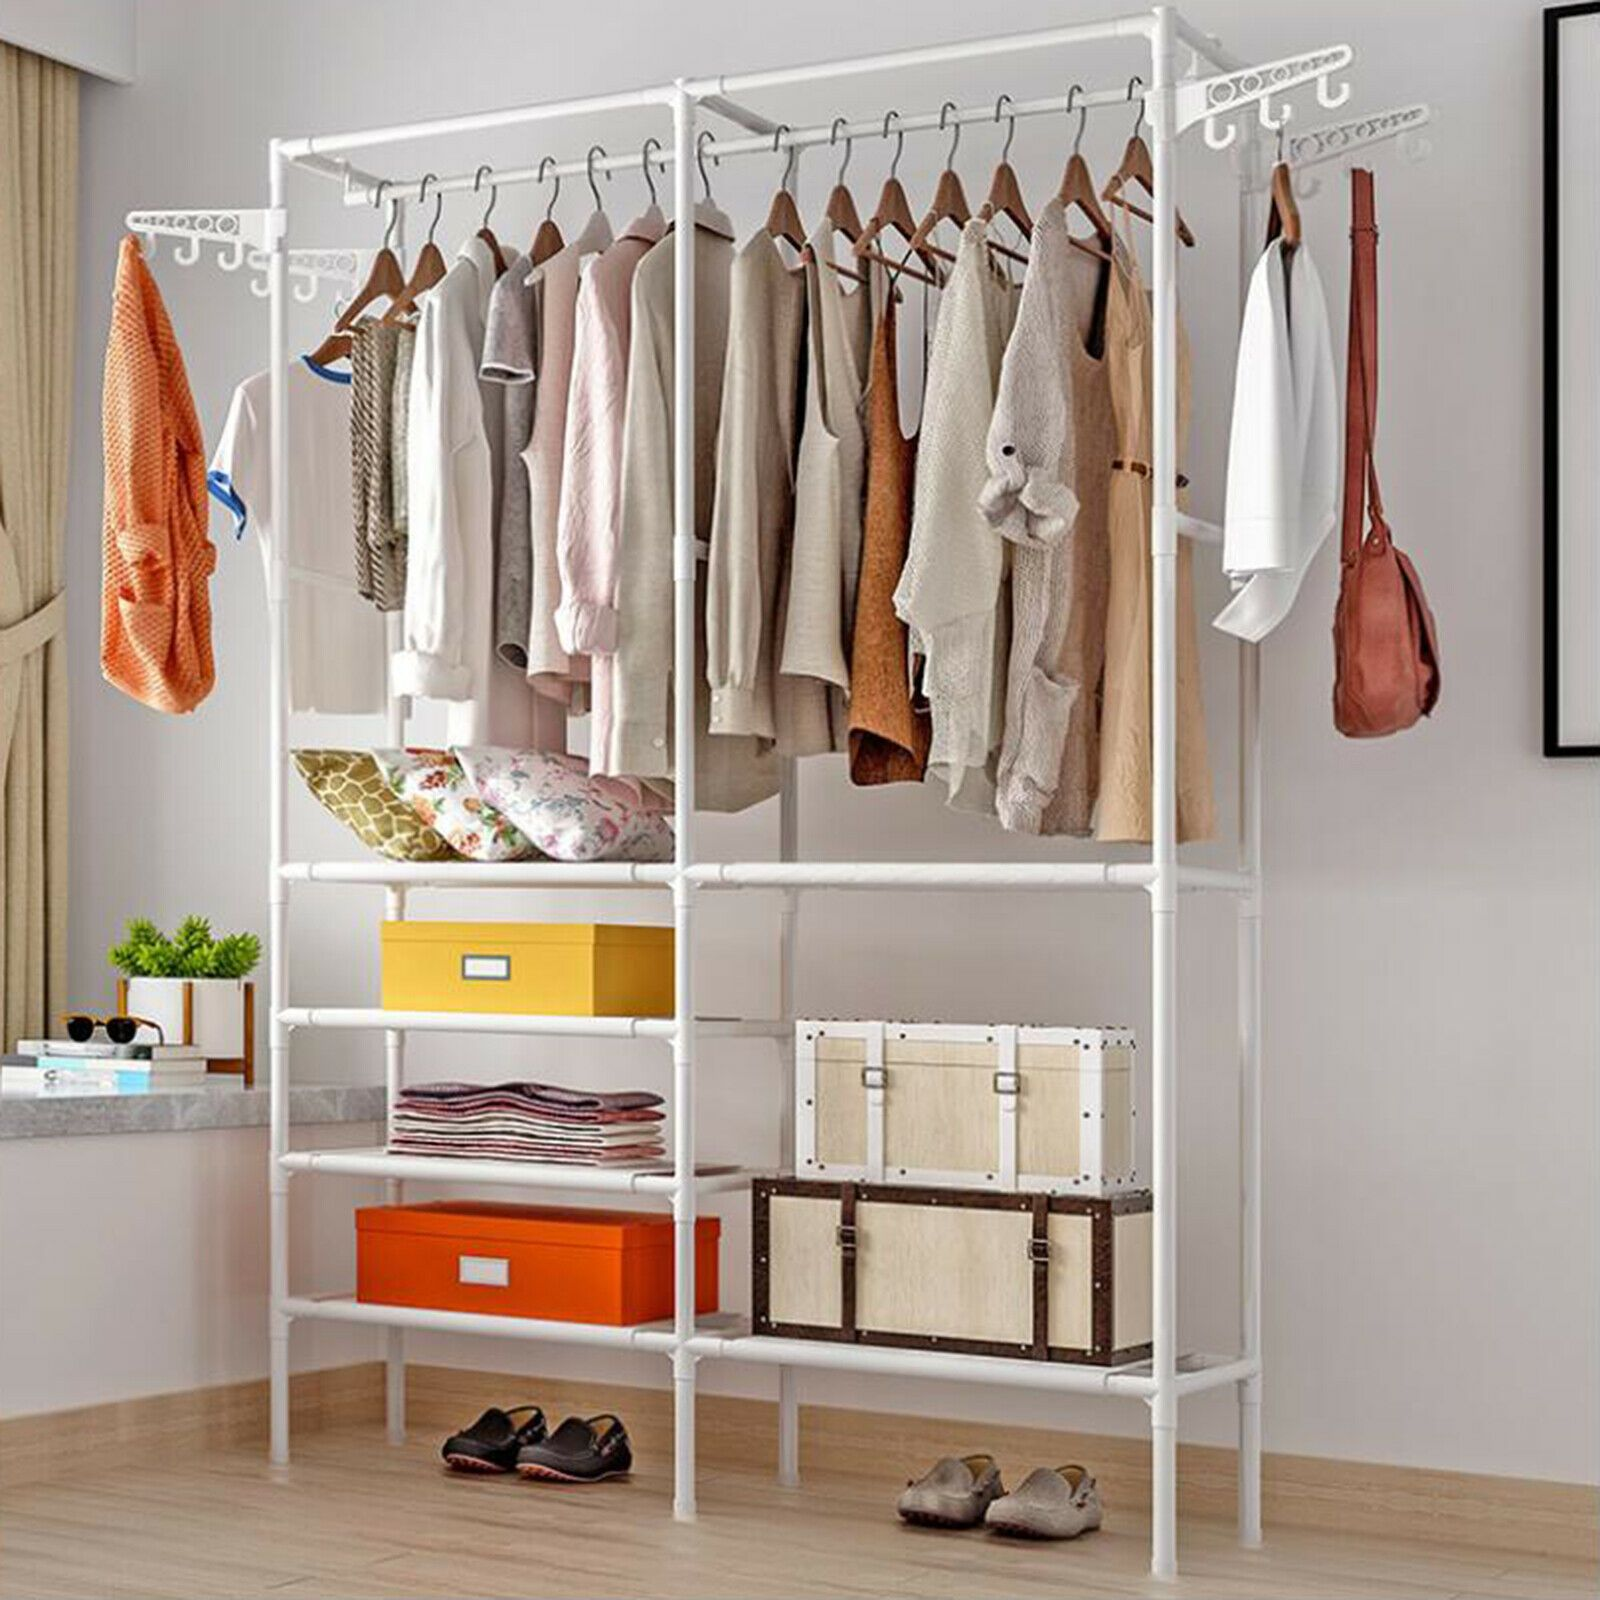 Metal Hanging Cloth Rack Closet Shelf Wardrobe Double Sided Storage W Hooks Closet Organizers Ideas Of Closet With Images Wardrobe Storage Storage Closet Organization